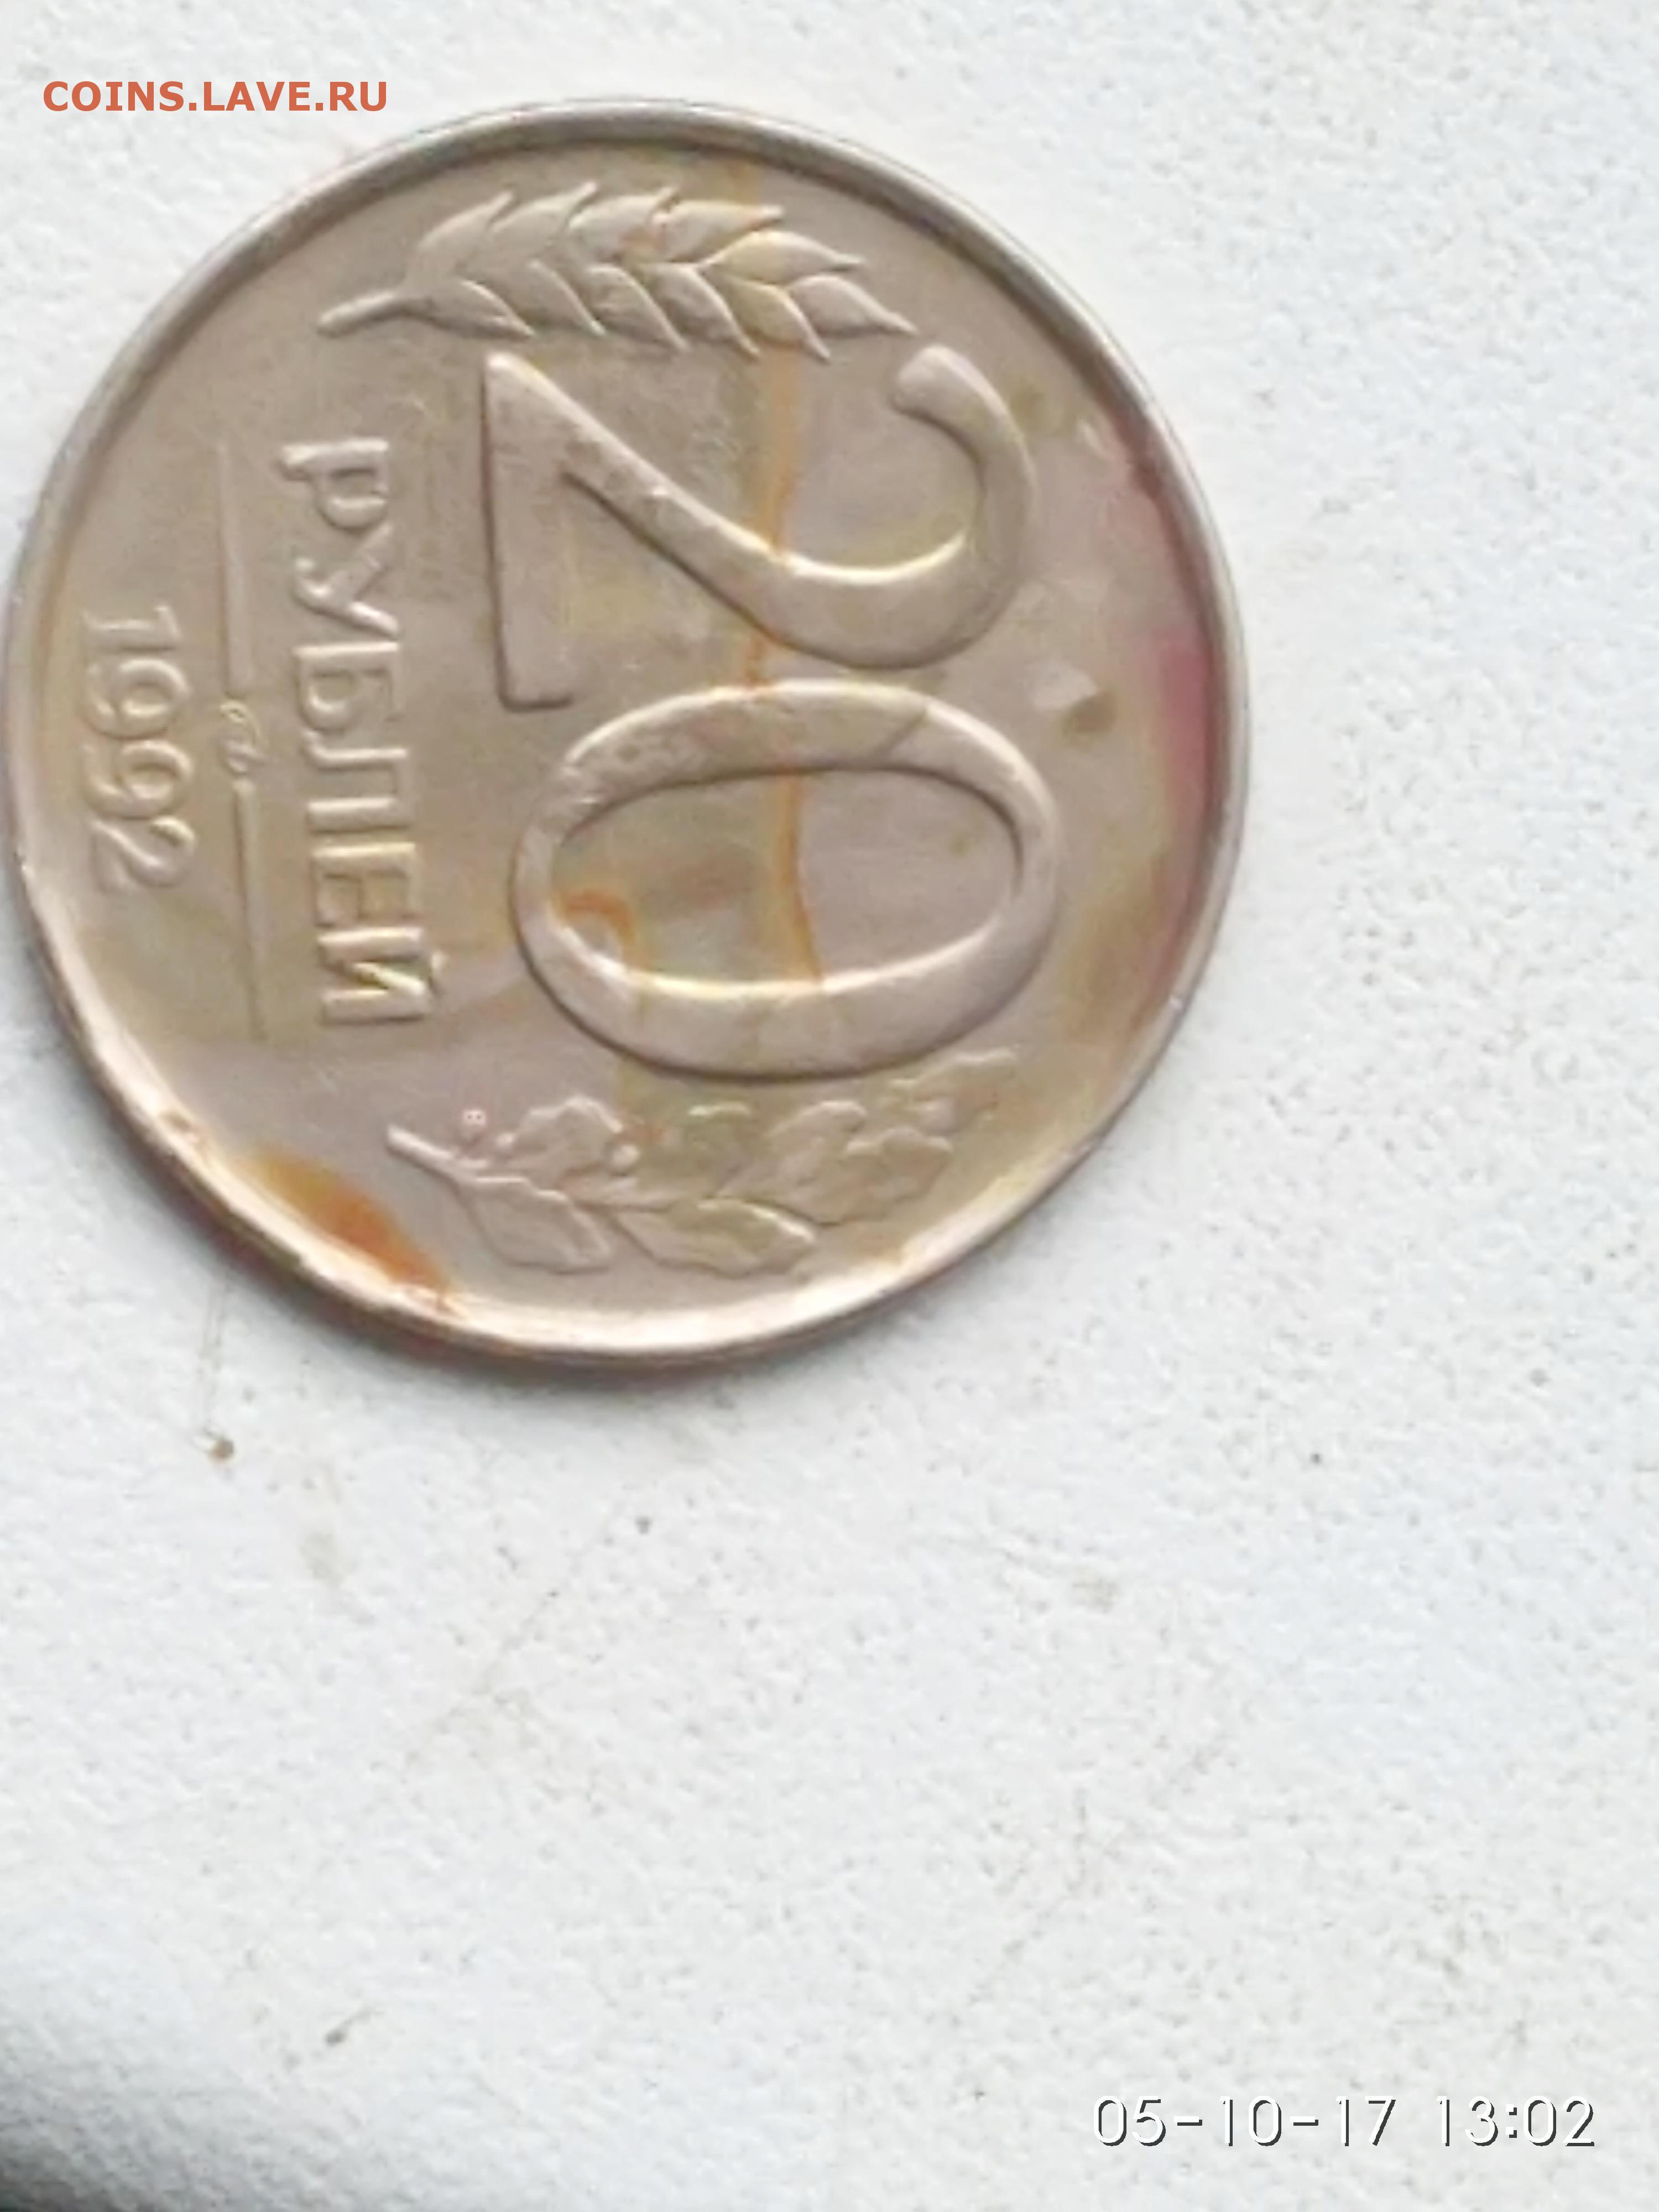 Nastya1989 новосибирск монета 25 рублей 2016 футбол 2018